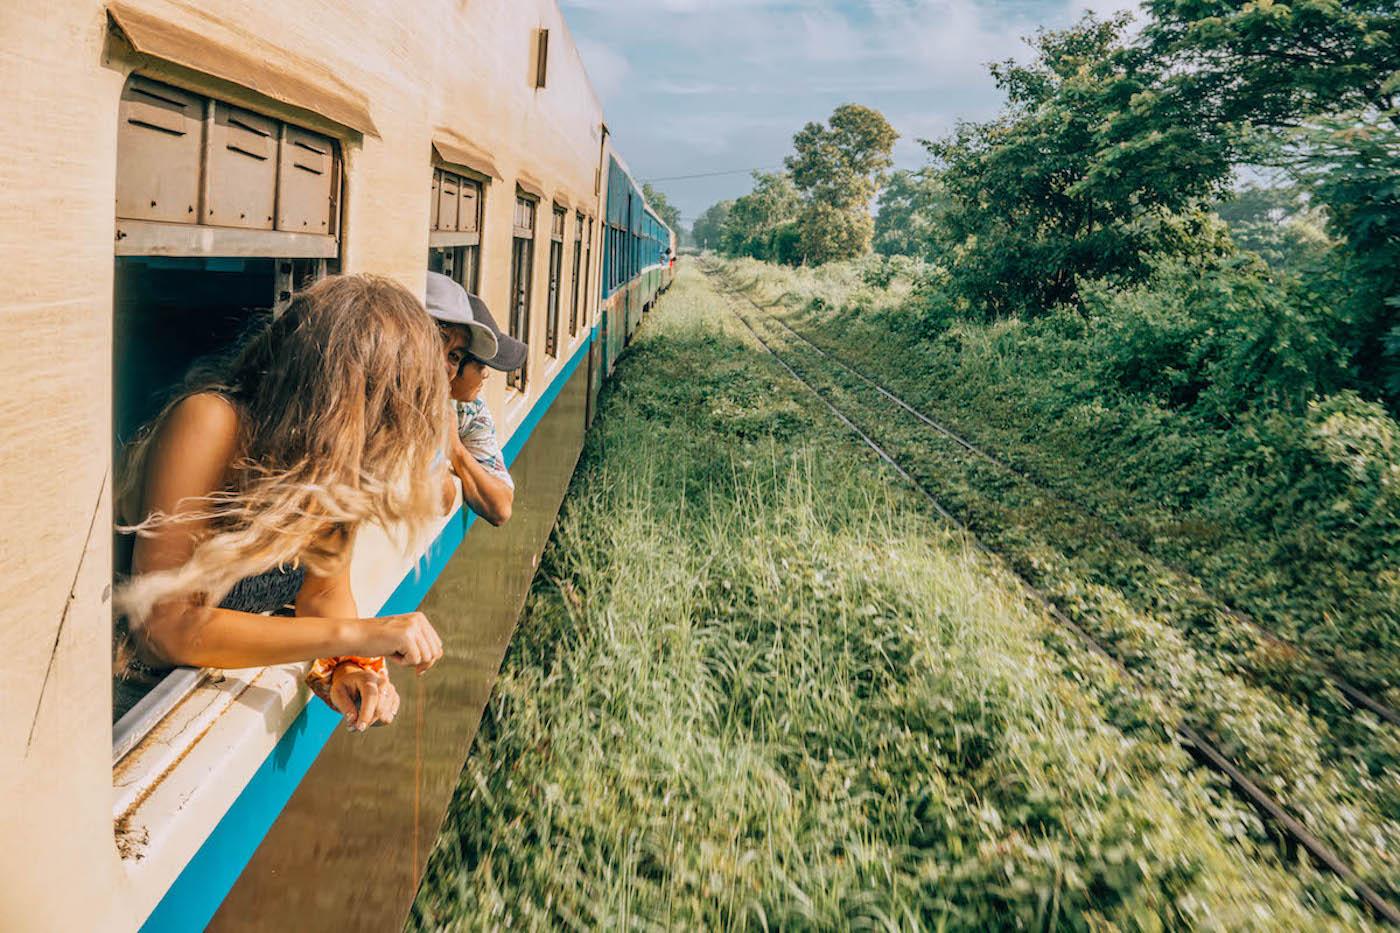 myanmar-unique-things-to-do-yangon-circular-train-1.jpg